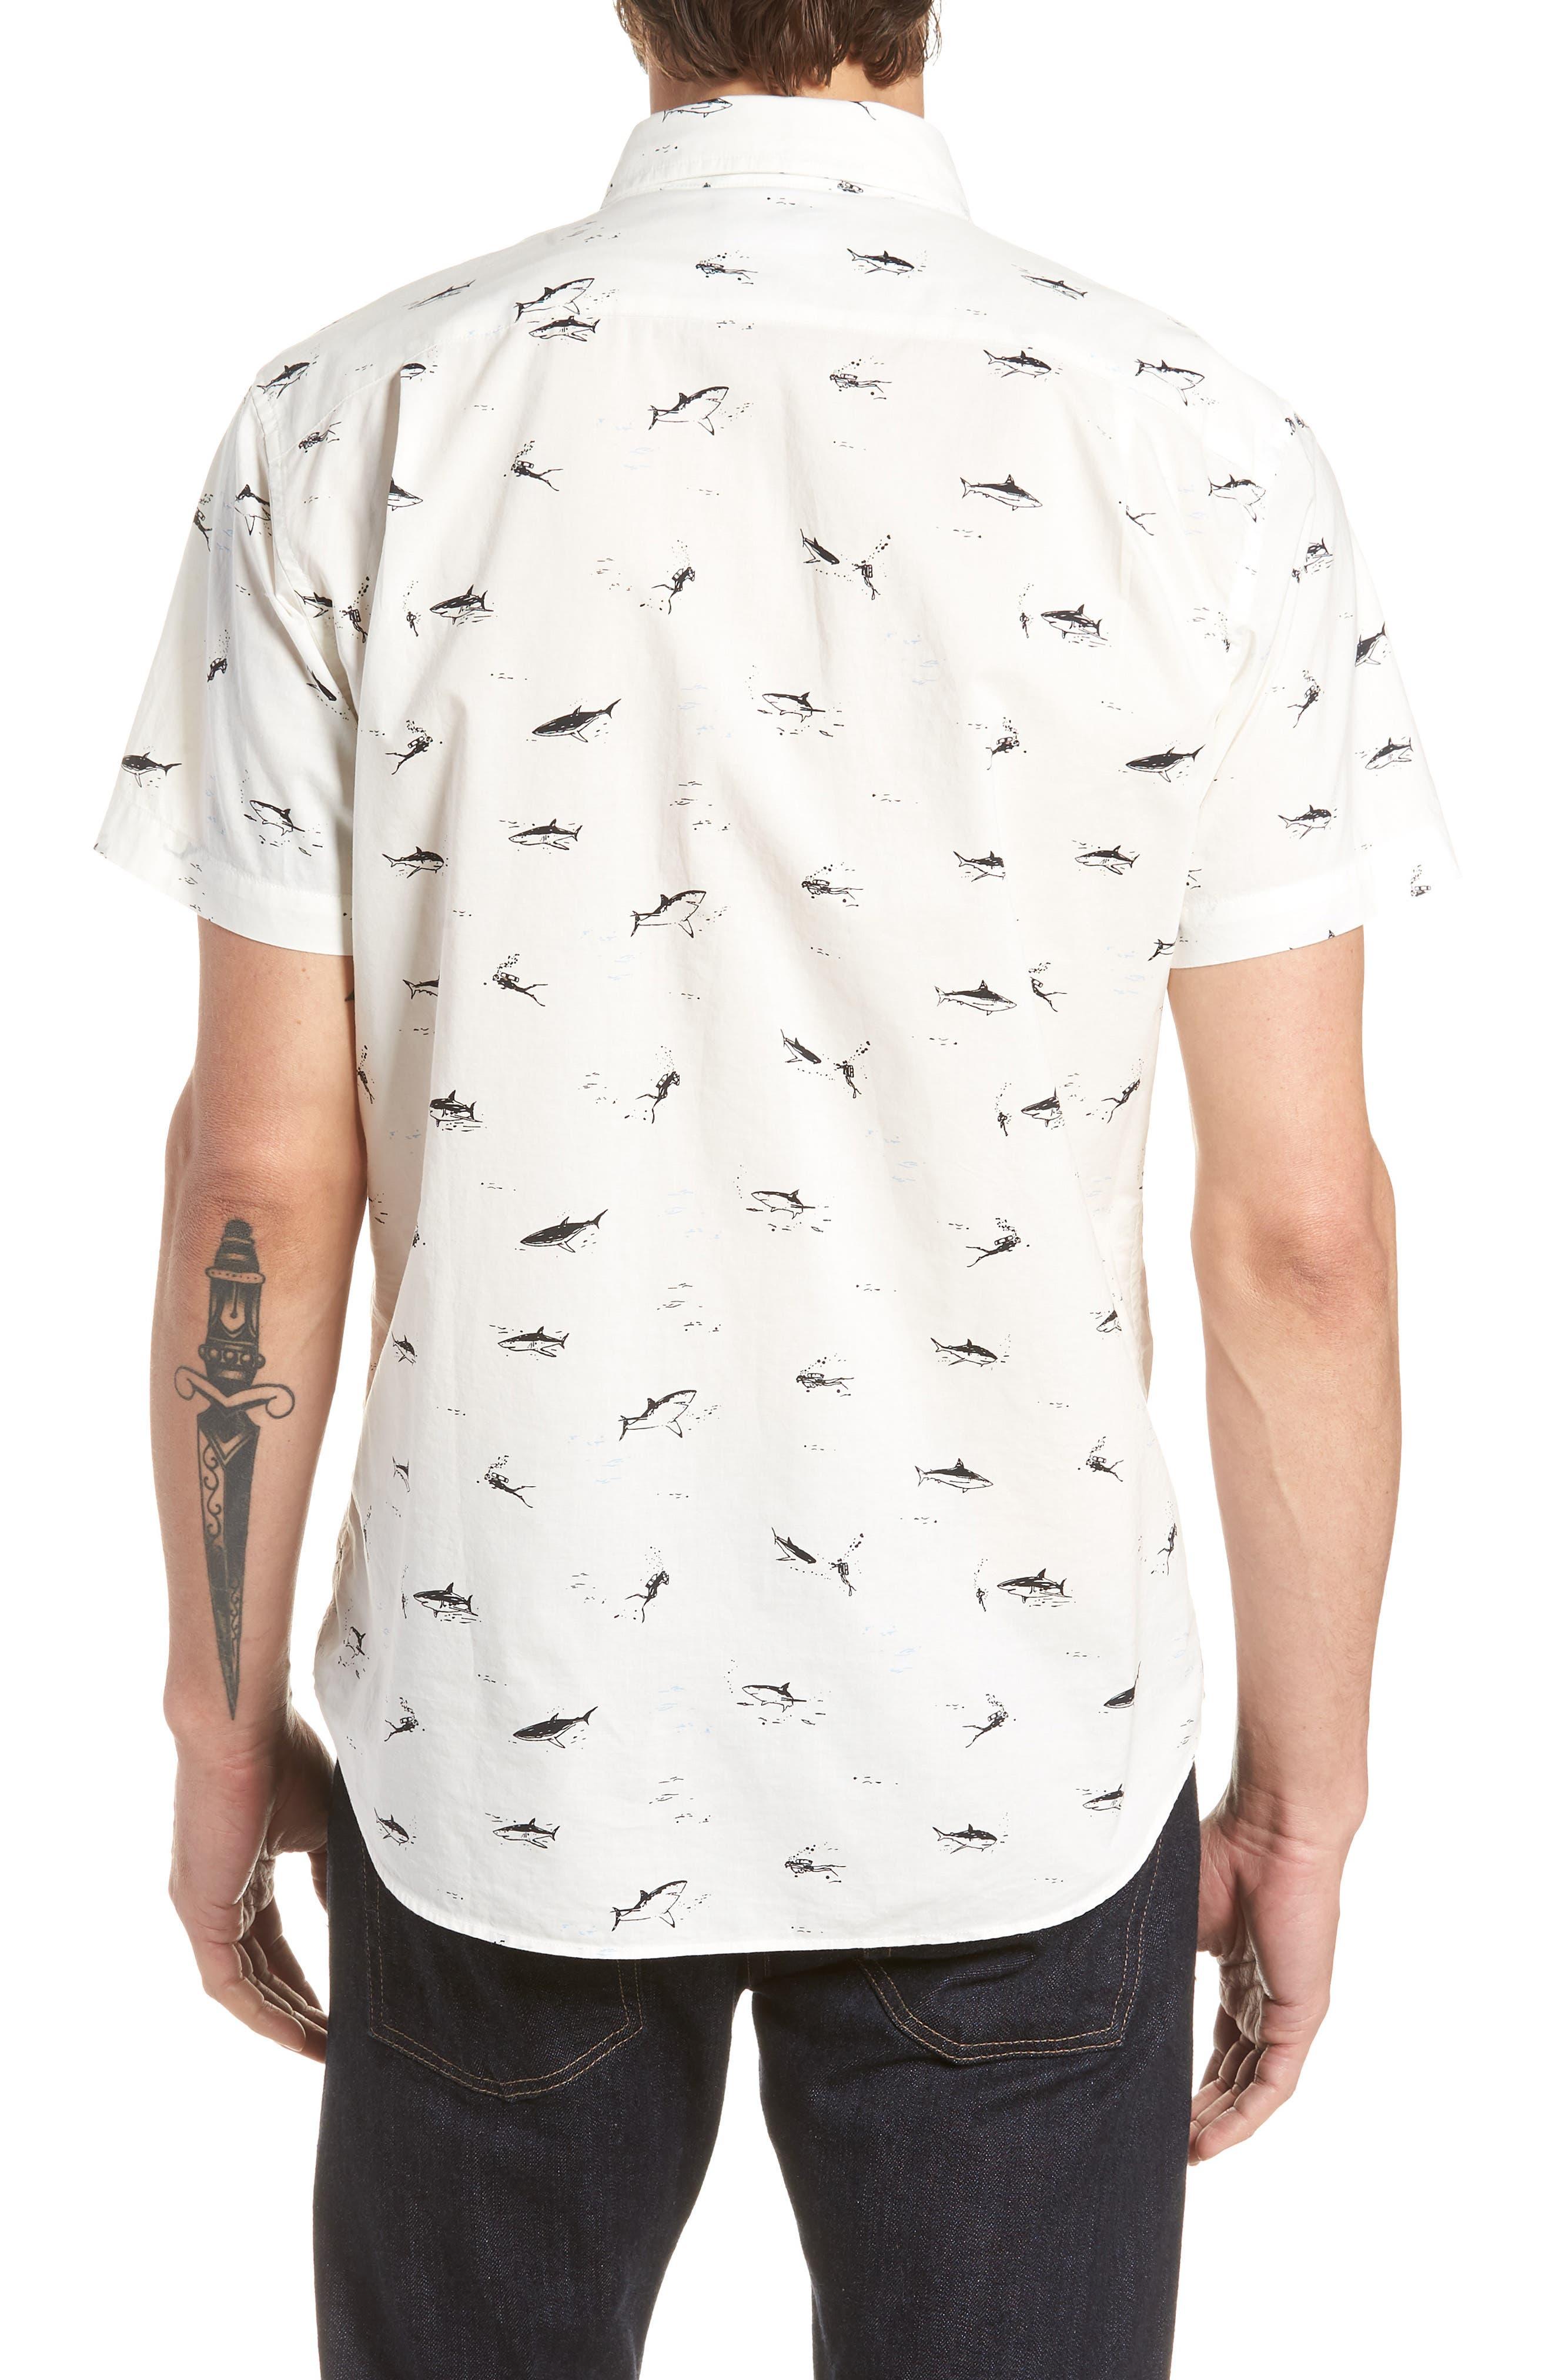 Riviera Slim Fit Shark Print Sport Shirt,                             Alternate thumbnail 3, color,                             Scuba Dive - Jet Black